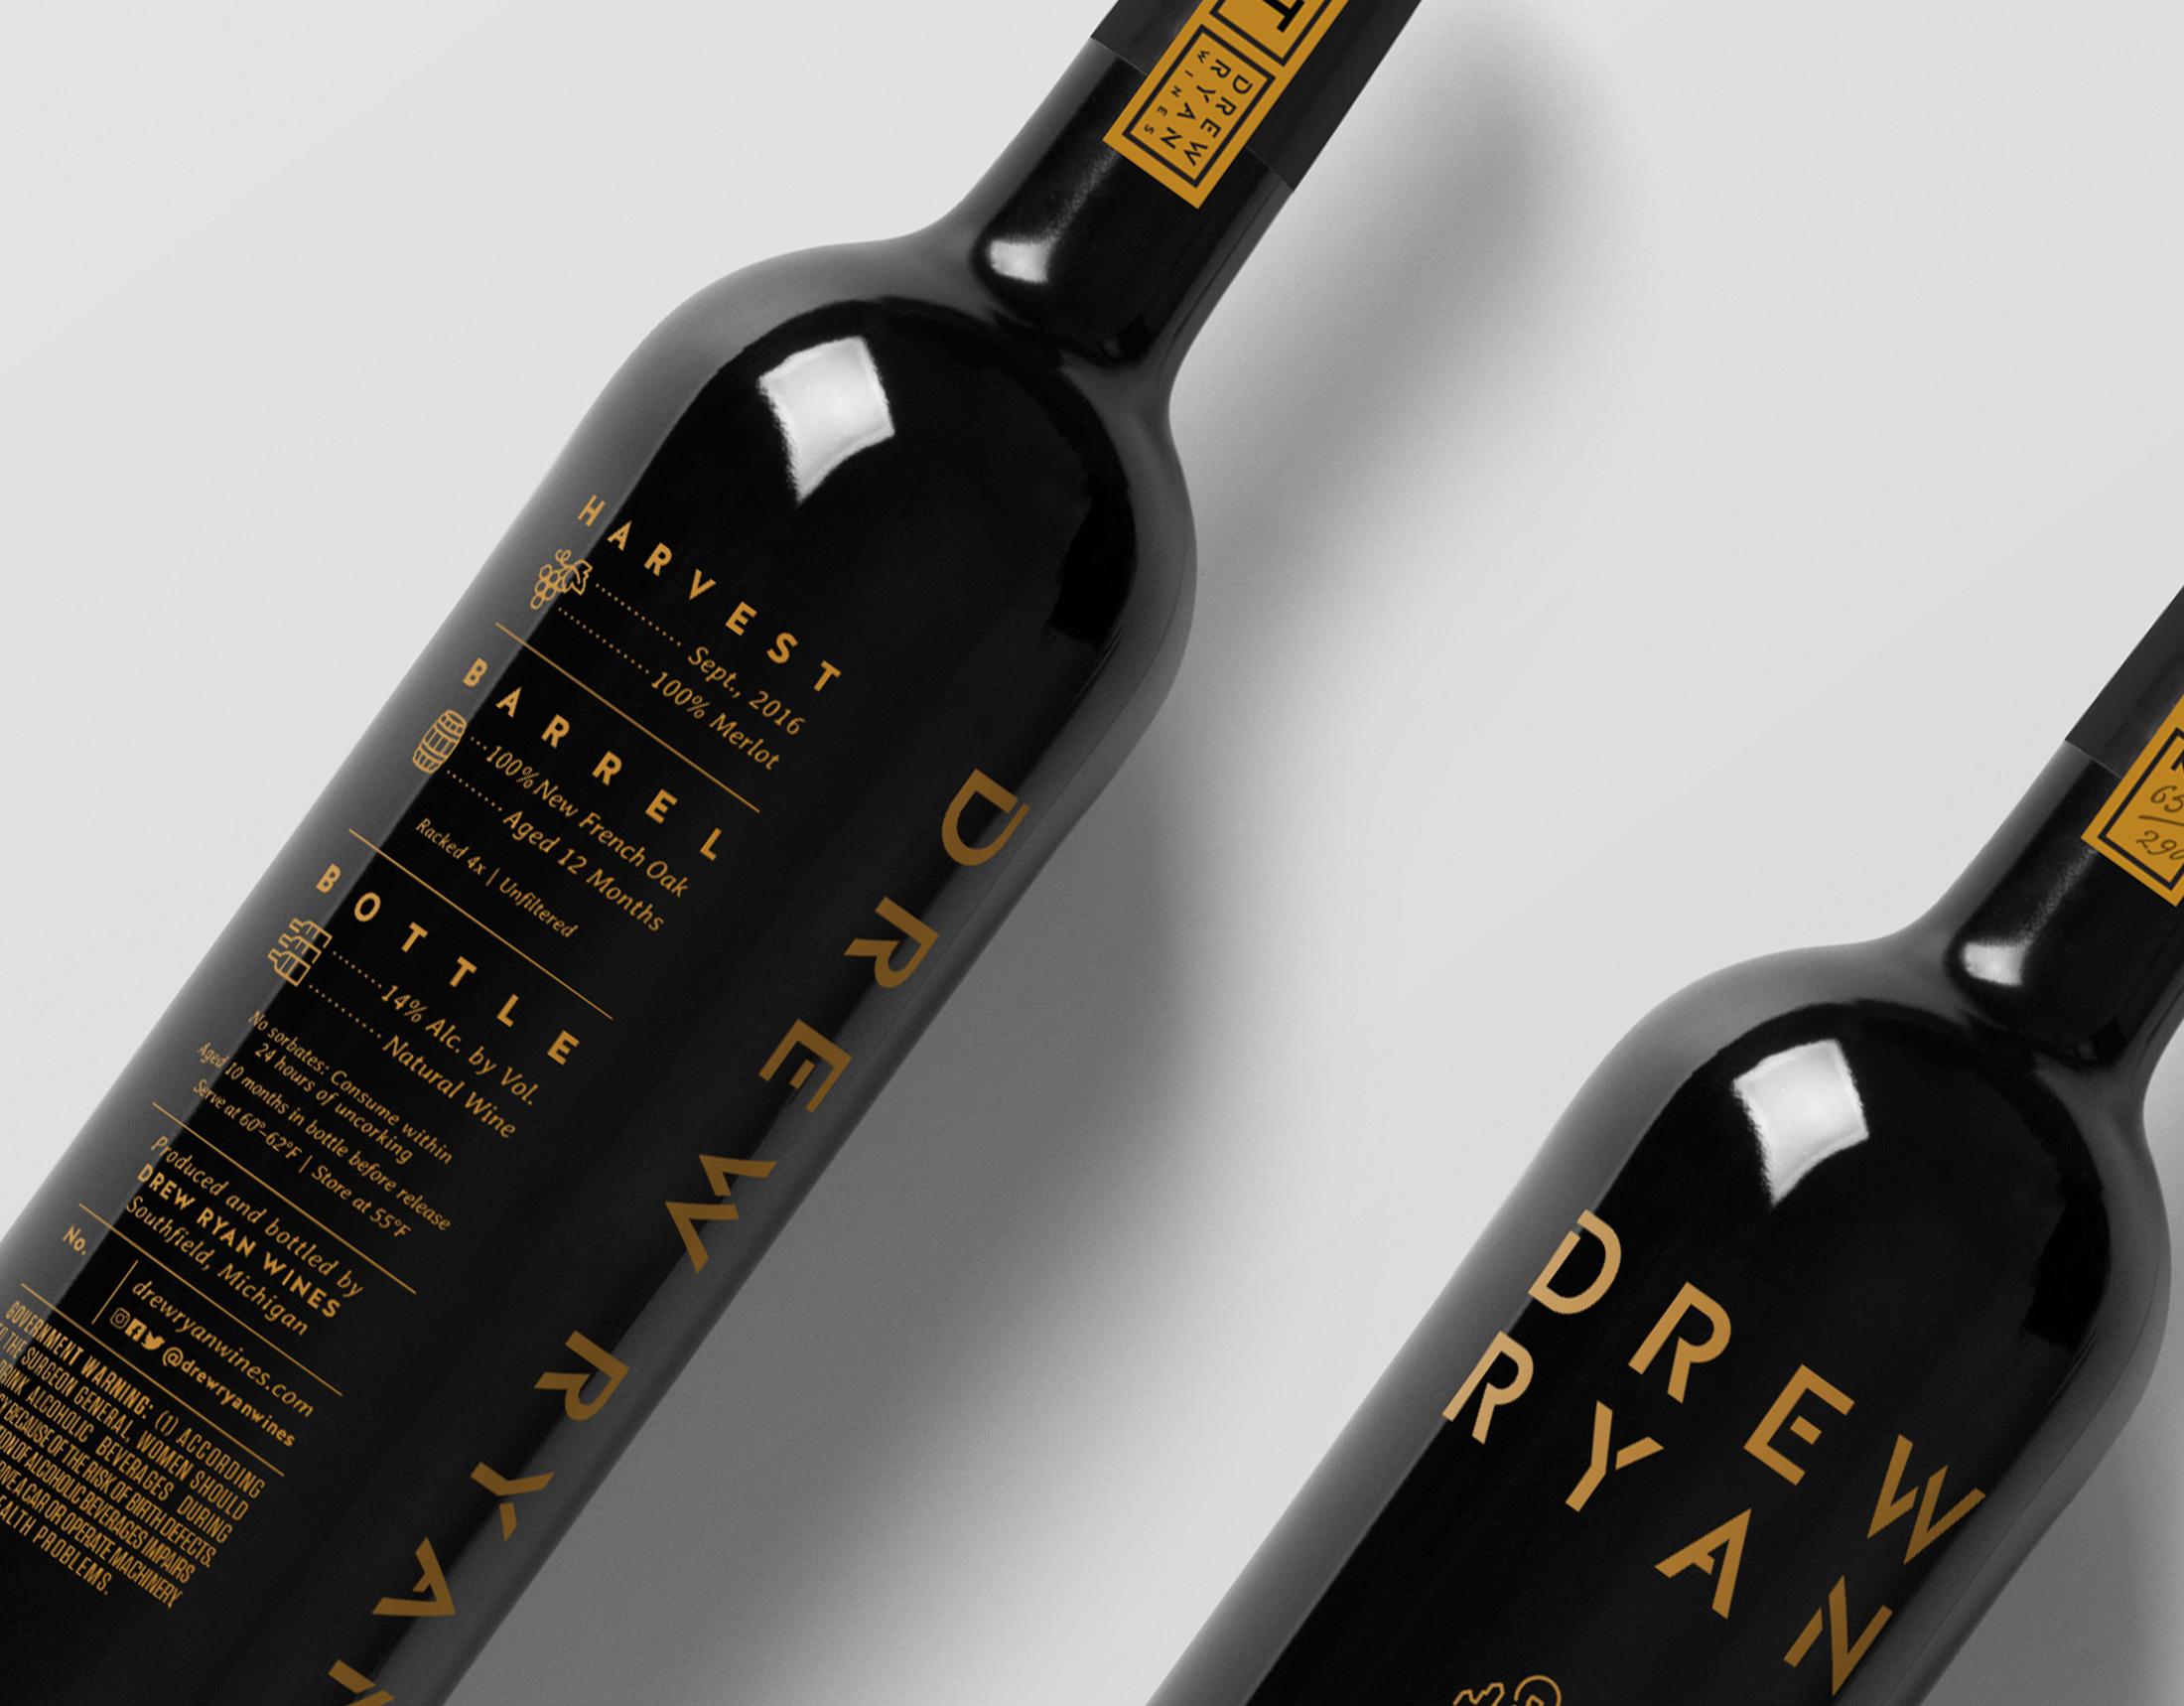 Wine-Branding_Ebbing_Drew-Ryan-Wine-Bottle-Label-Back-Design.jpg